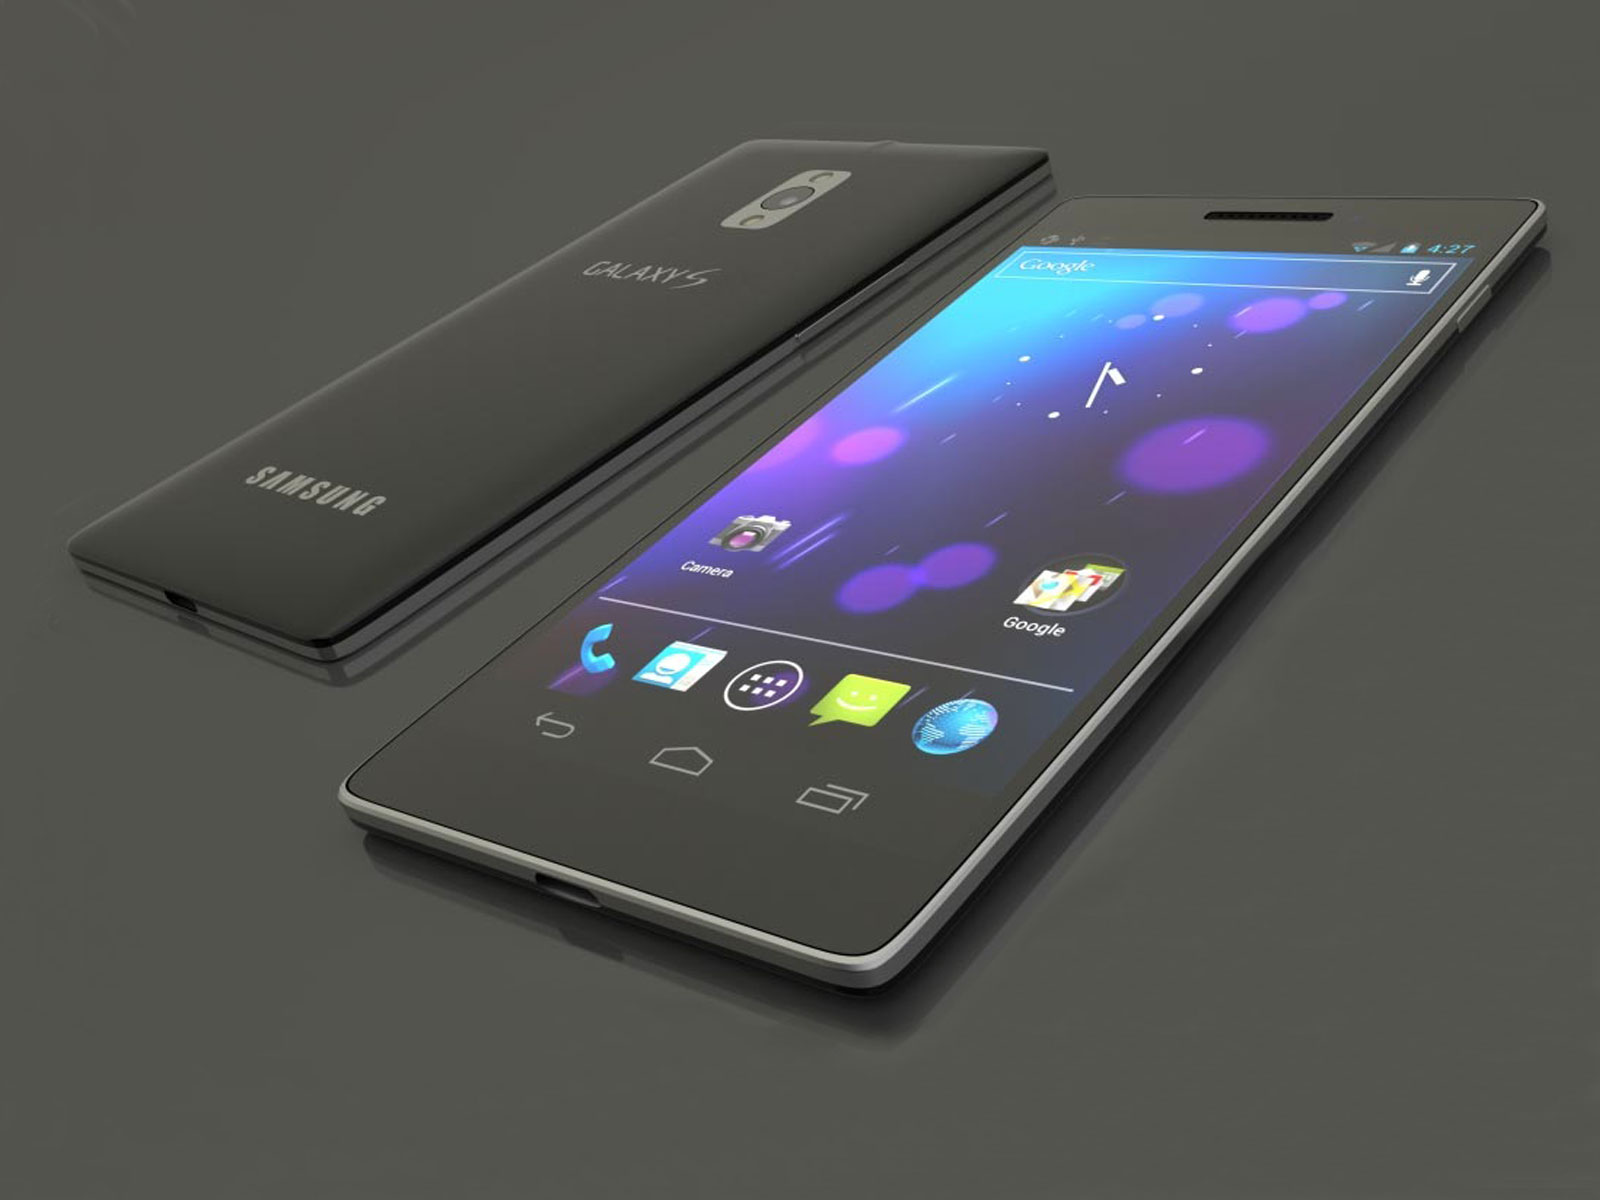 http://2.bp.blogspot.com/-7Wo_wSE2r0o/UVgb2tbJxmI/AAAAAAABgEQ/YnvyscRObKU/s1600/Samsung-Galaxy-S4-fatures-2.jpg